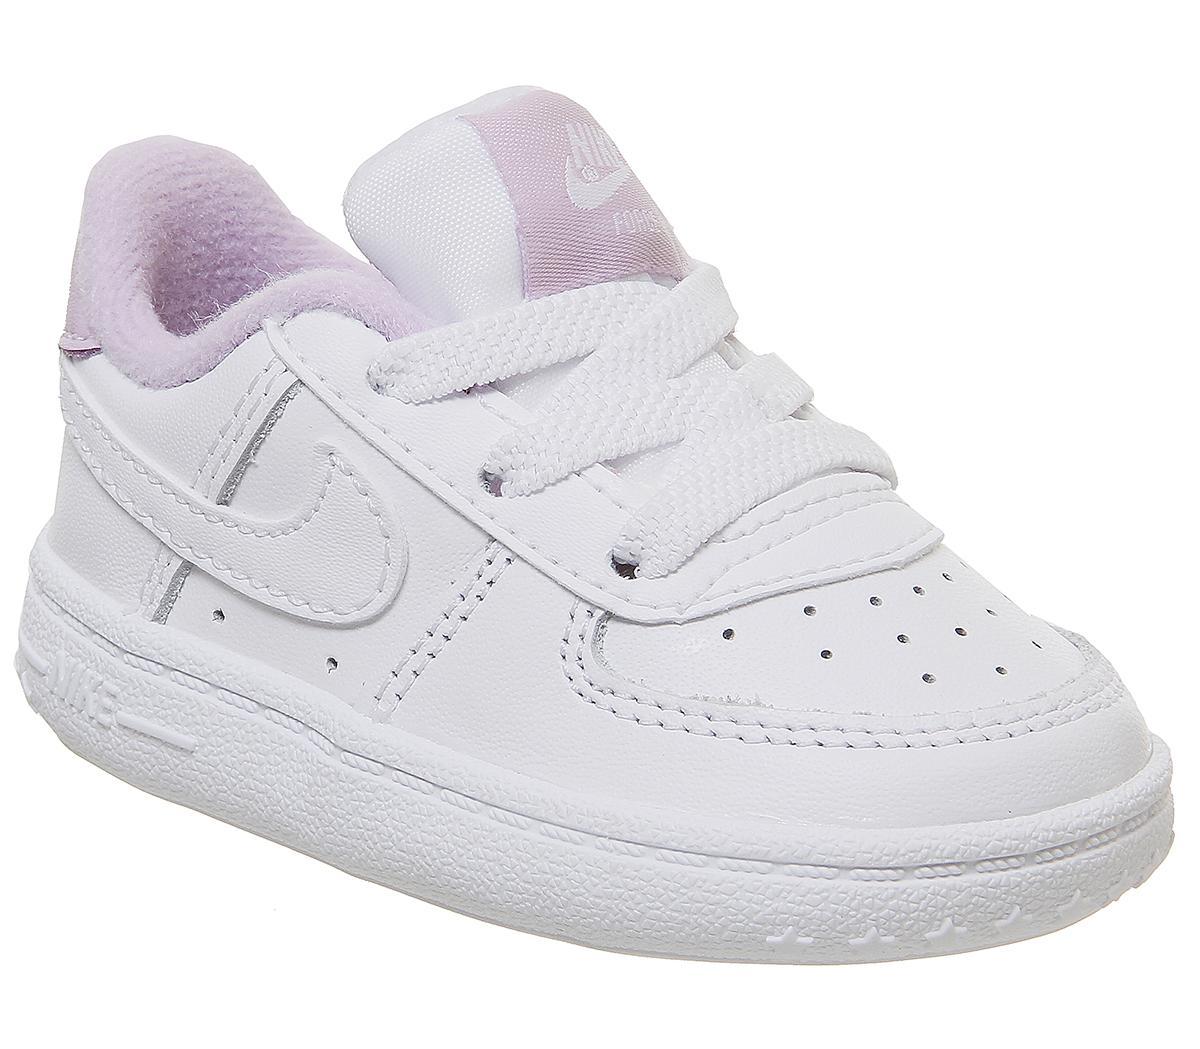 Nike Air Force 1 Crib Trainers White